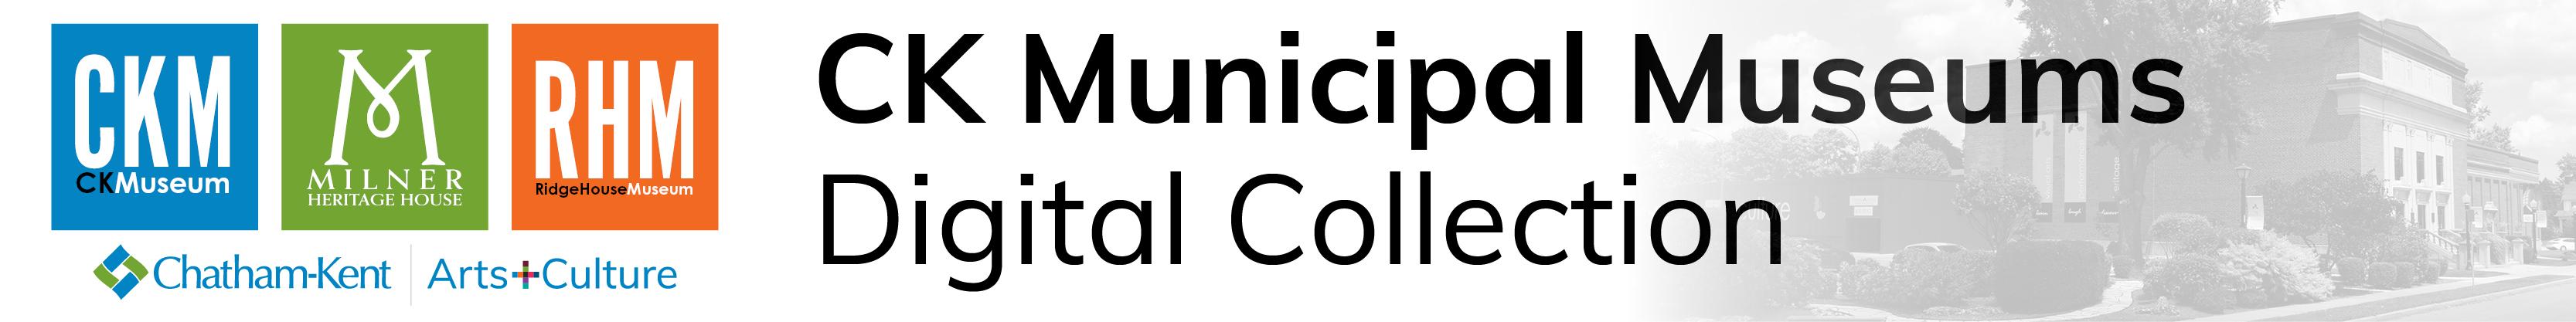 Chatham-Kent Municipal Museums - Digital Collections